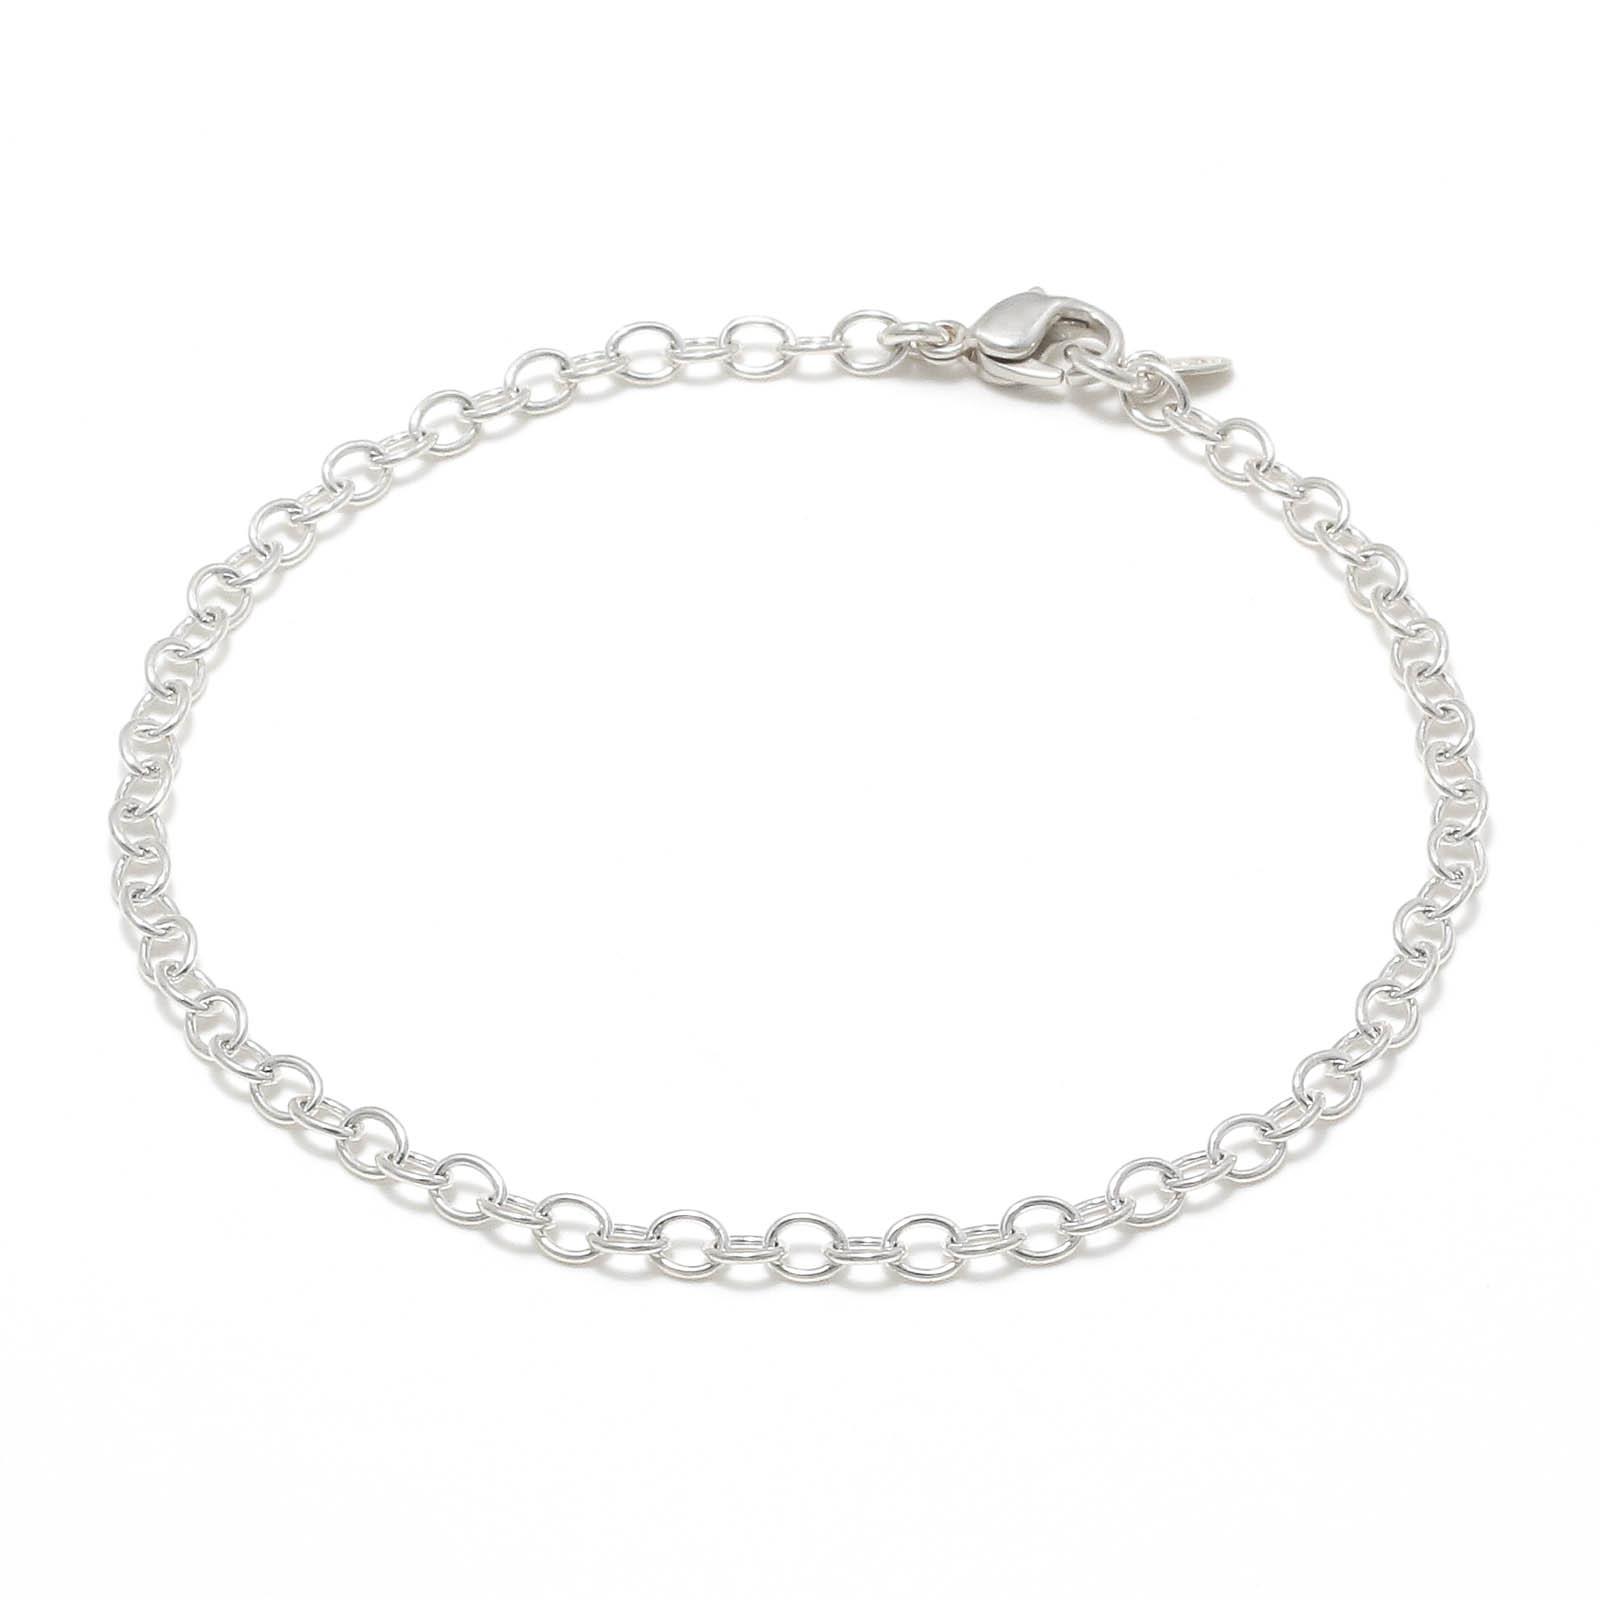 JUST GOOD Chain Bracelet - Round - Silver